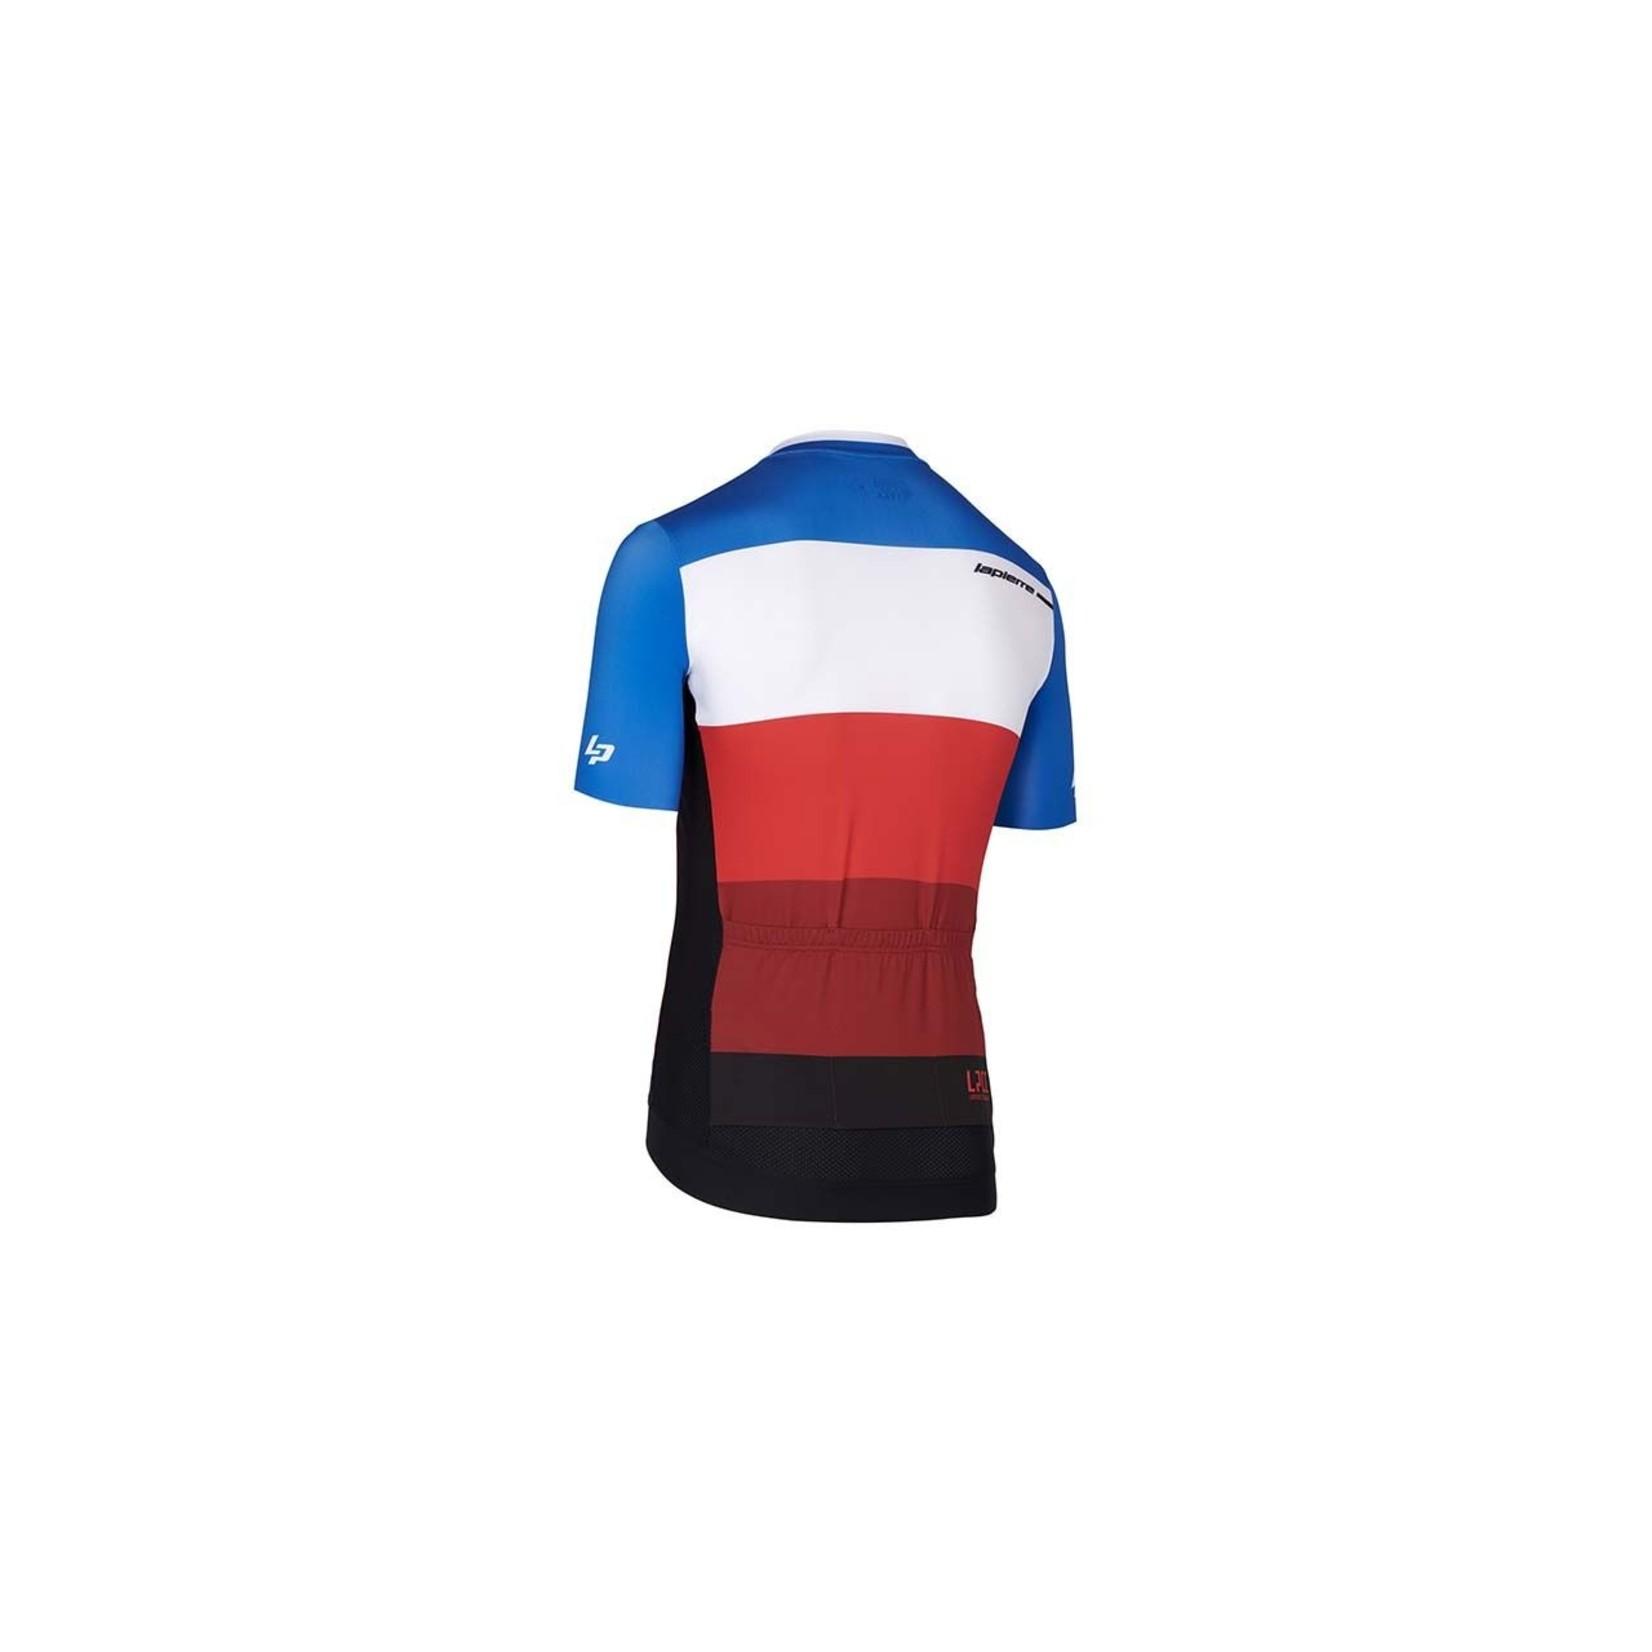 Lapierre Superlight So Frenchy Cycling Jersey Medium 2019